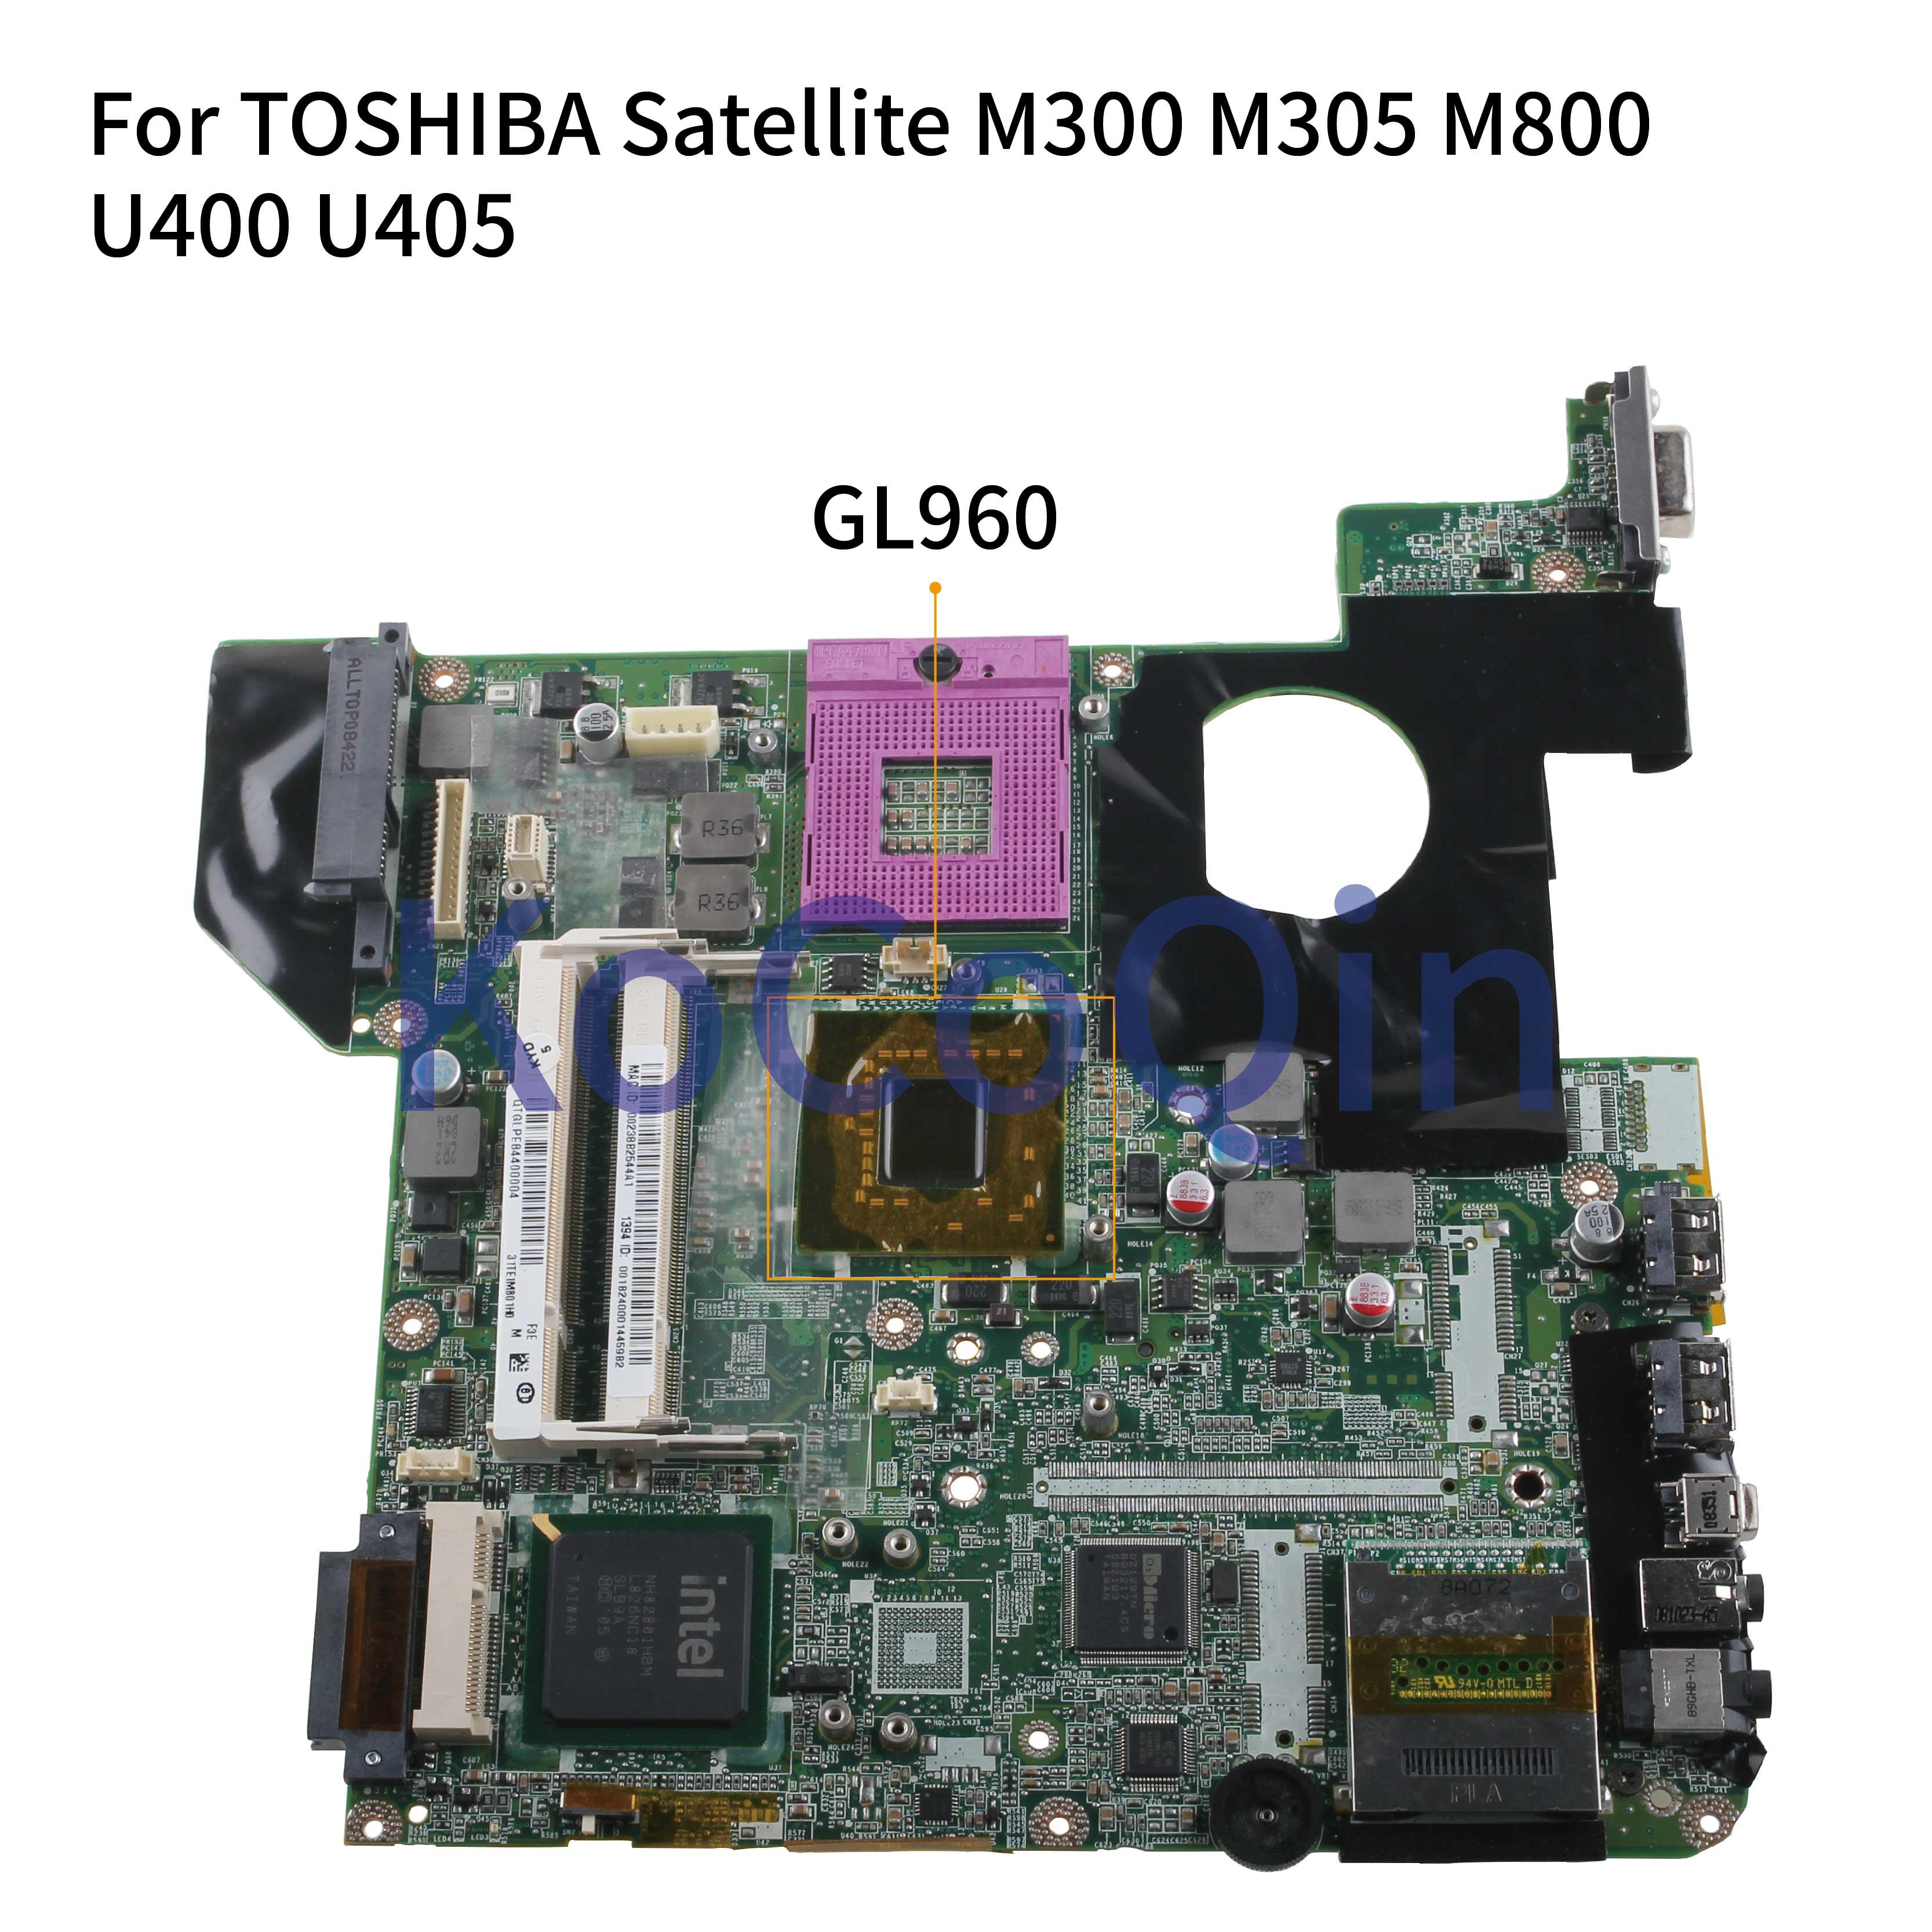 KoCoQin Laptop Motherboard For TOSHIBA Satellite M300 M305 M800 U400 U405 Mainboard DA0TE1MB8F0 GL960